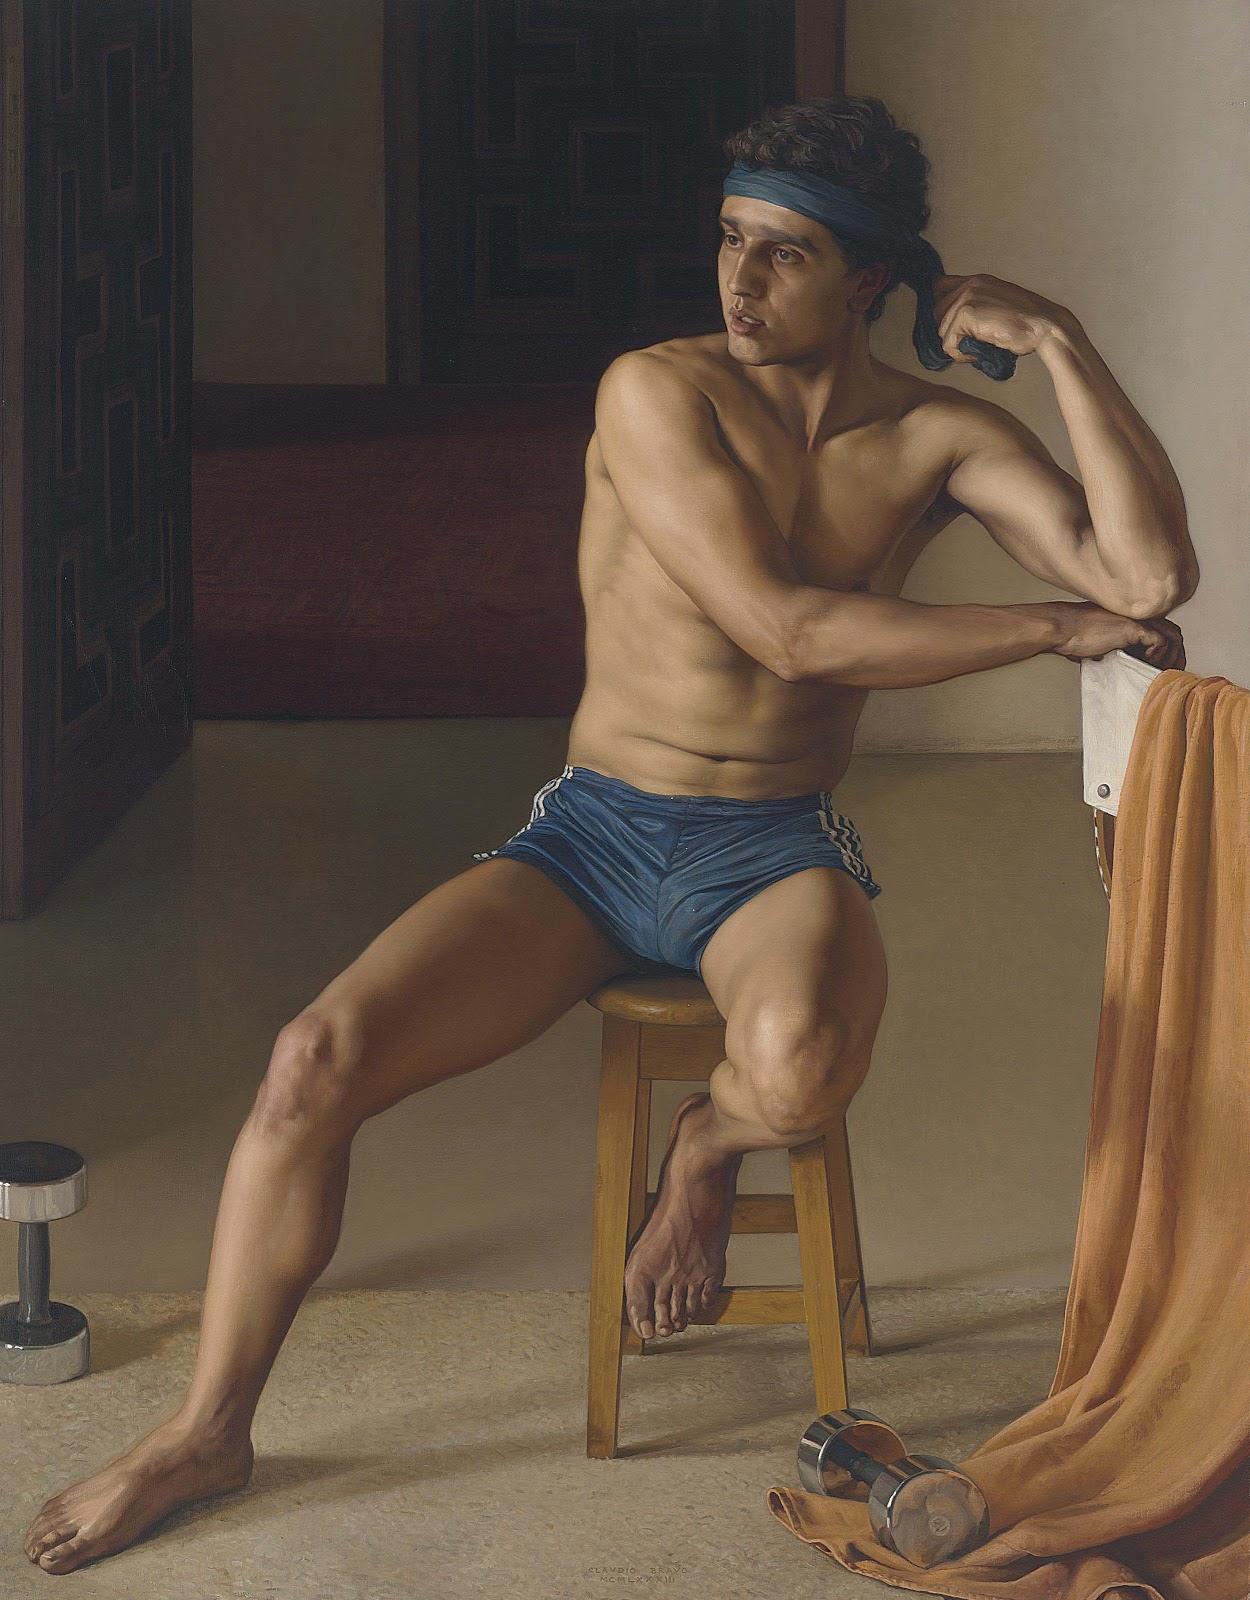 Claudio  ravo Camus Portrait of a young man